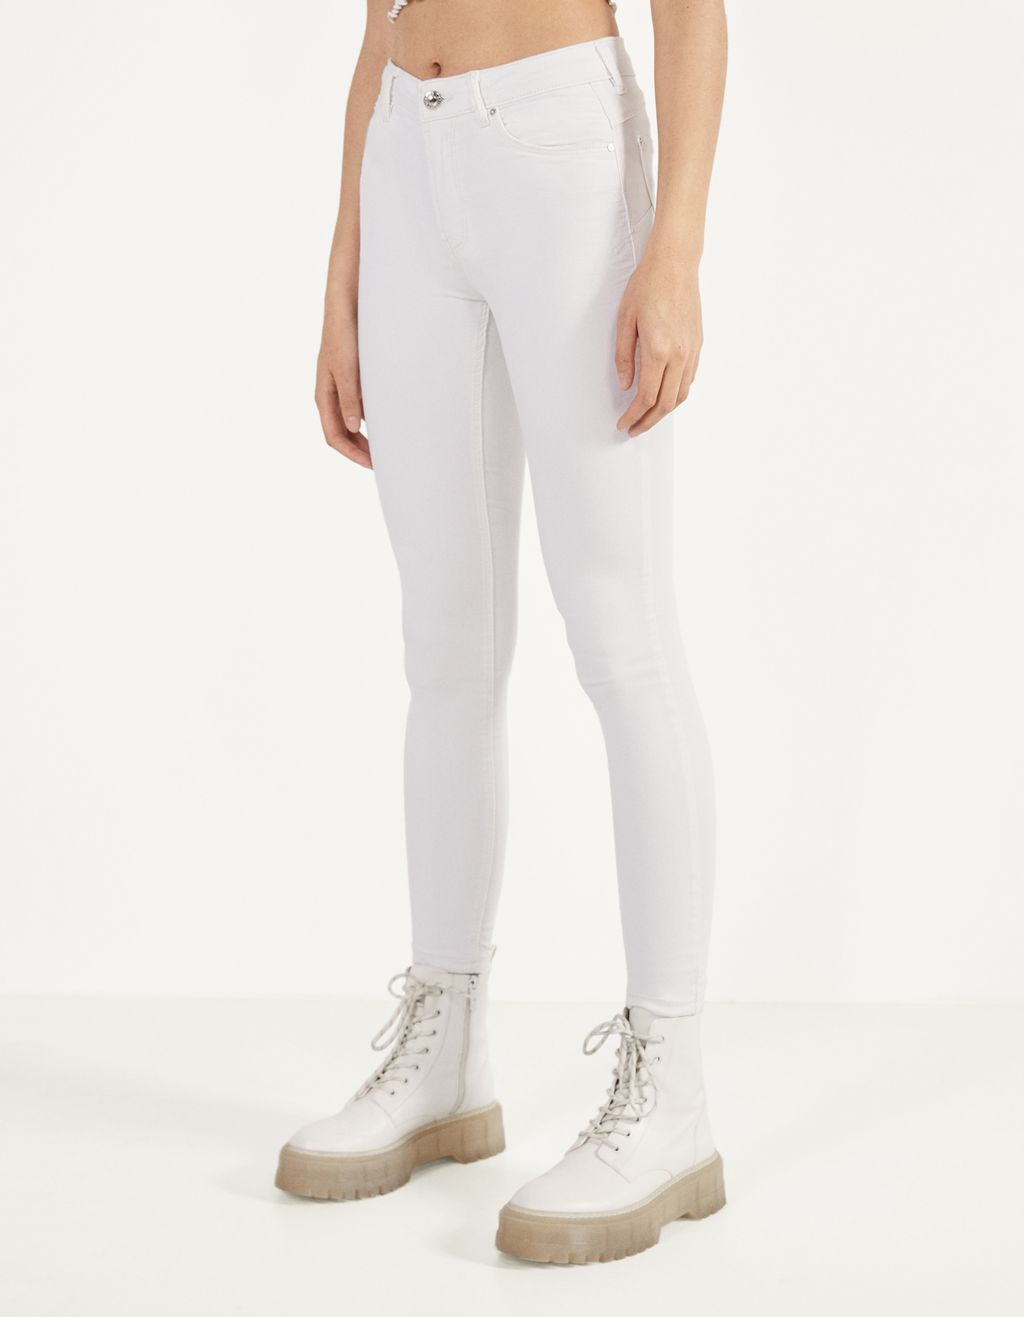 Five-pocket push-up jeans